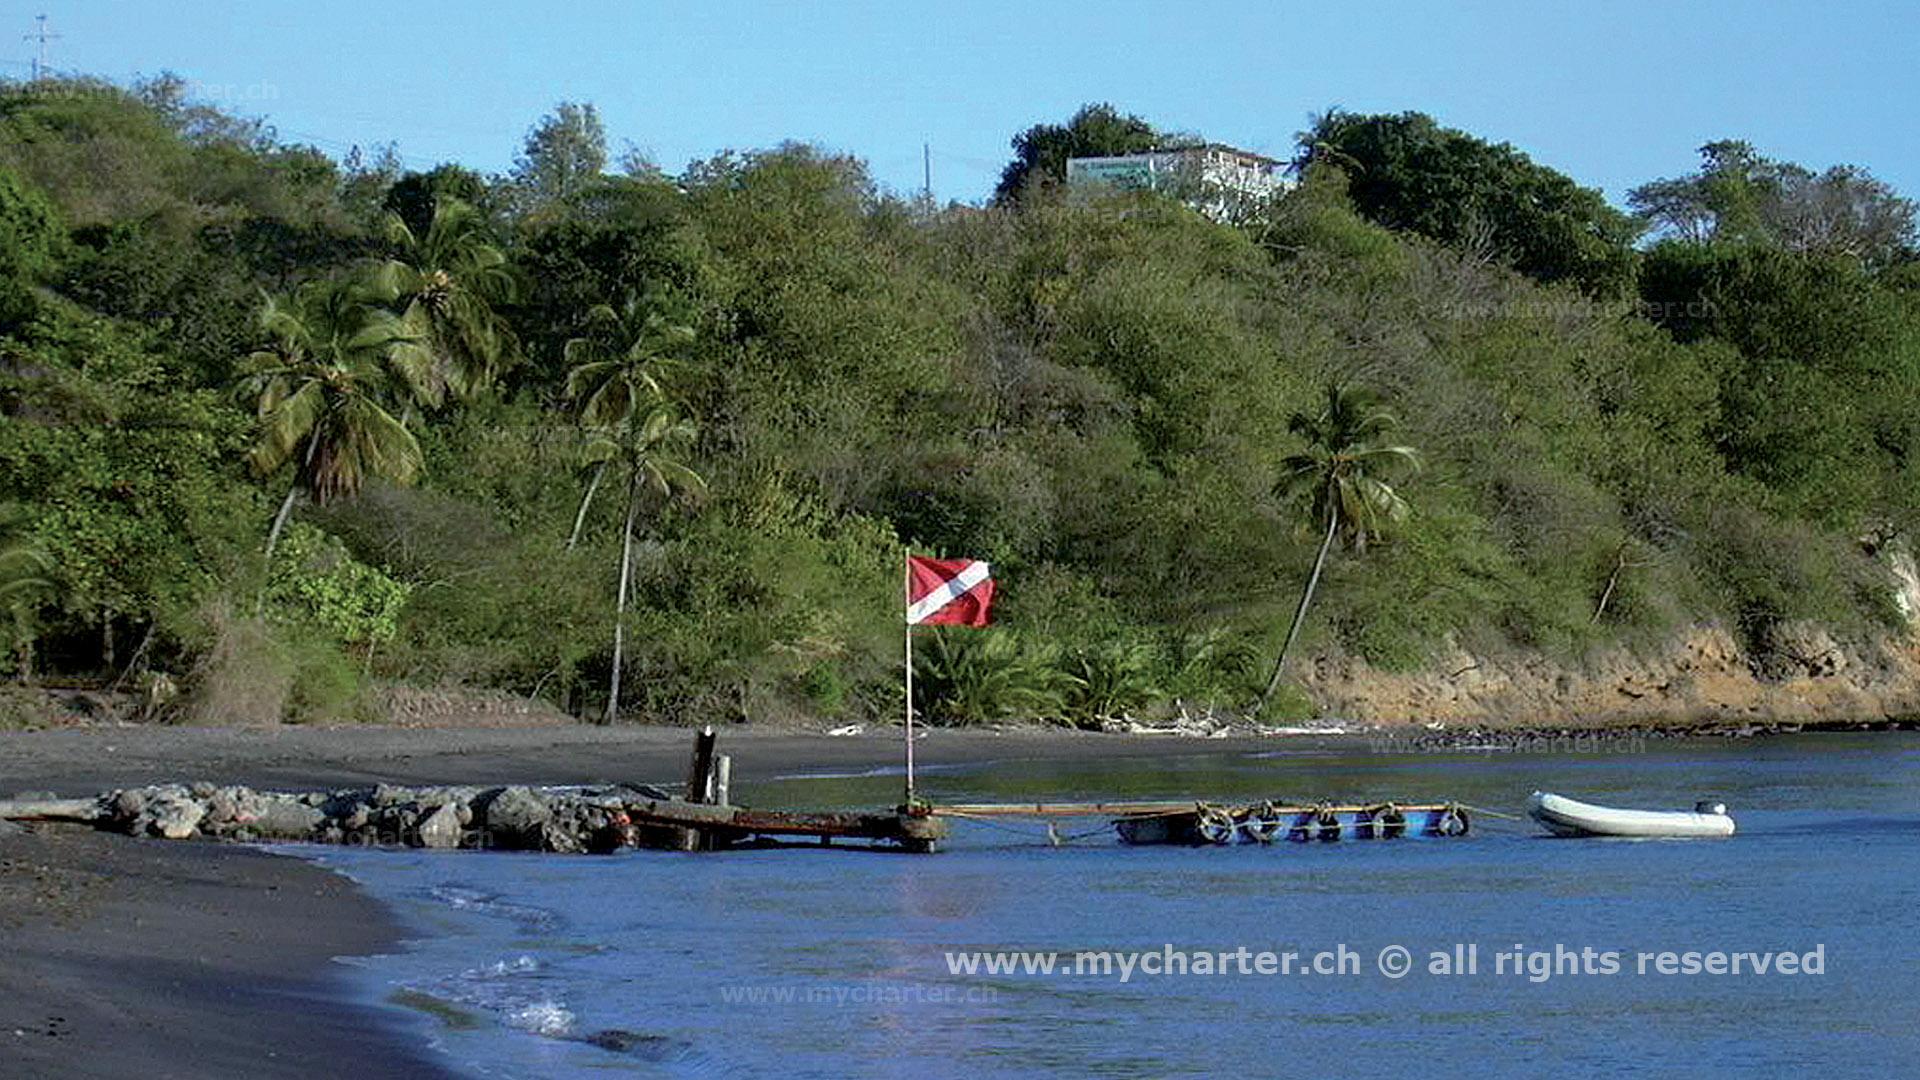 Dominica - Bucht auf Dominica